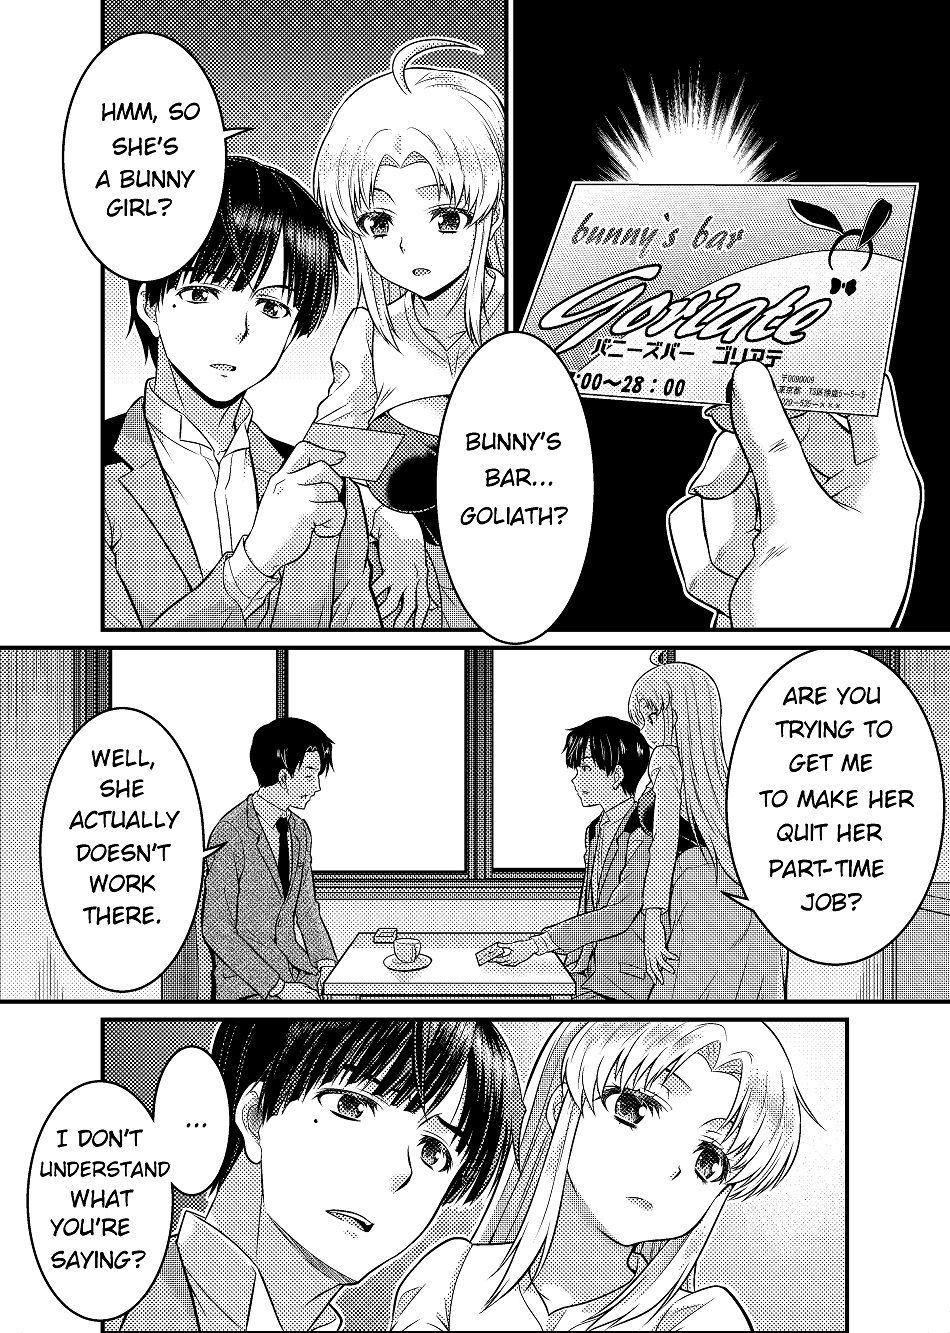 TS Detective Niizuma Hiromi Investigate the missing college student case! Dreadful Bunny Girl